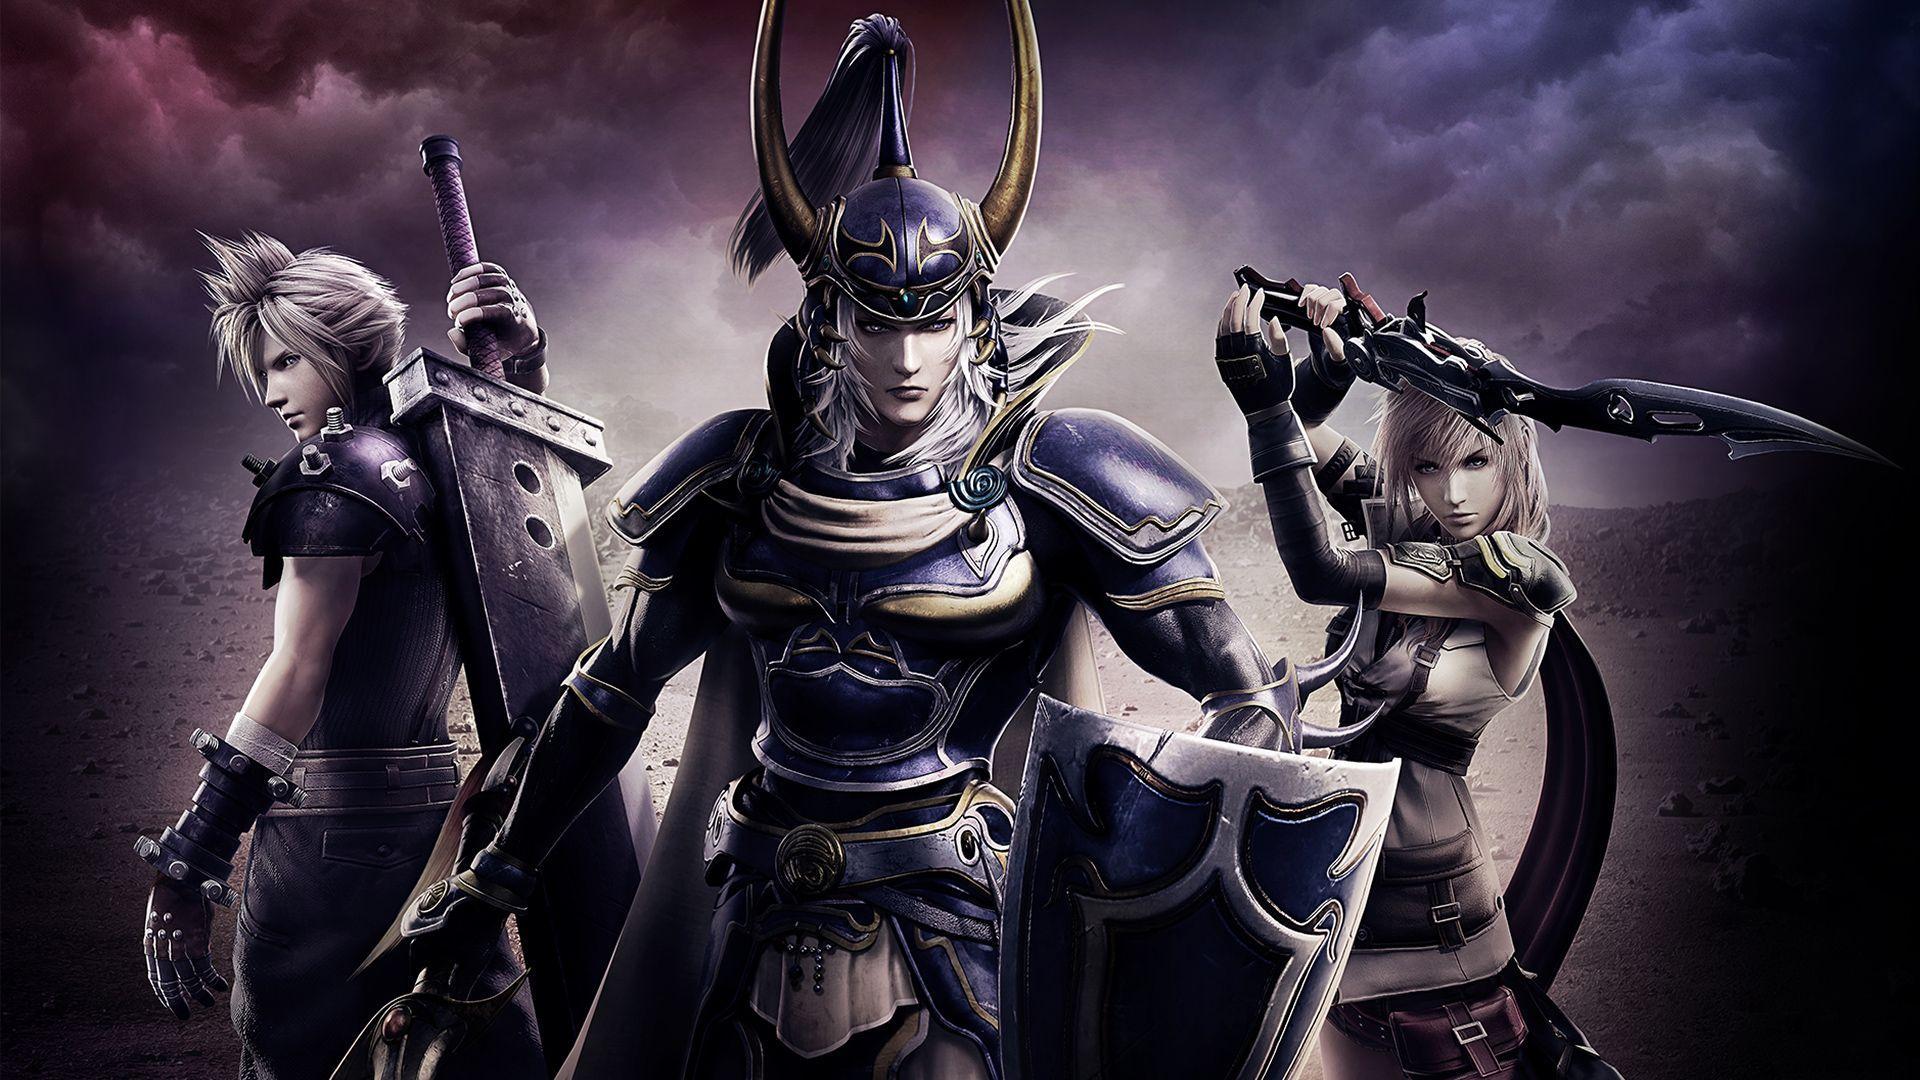 Dissidia Final Fantasy Nt Wallpapers Wallpaper Cave